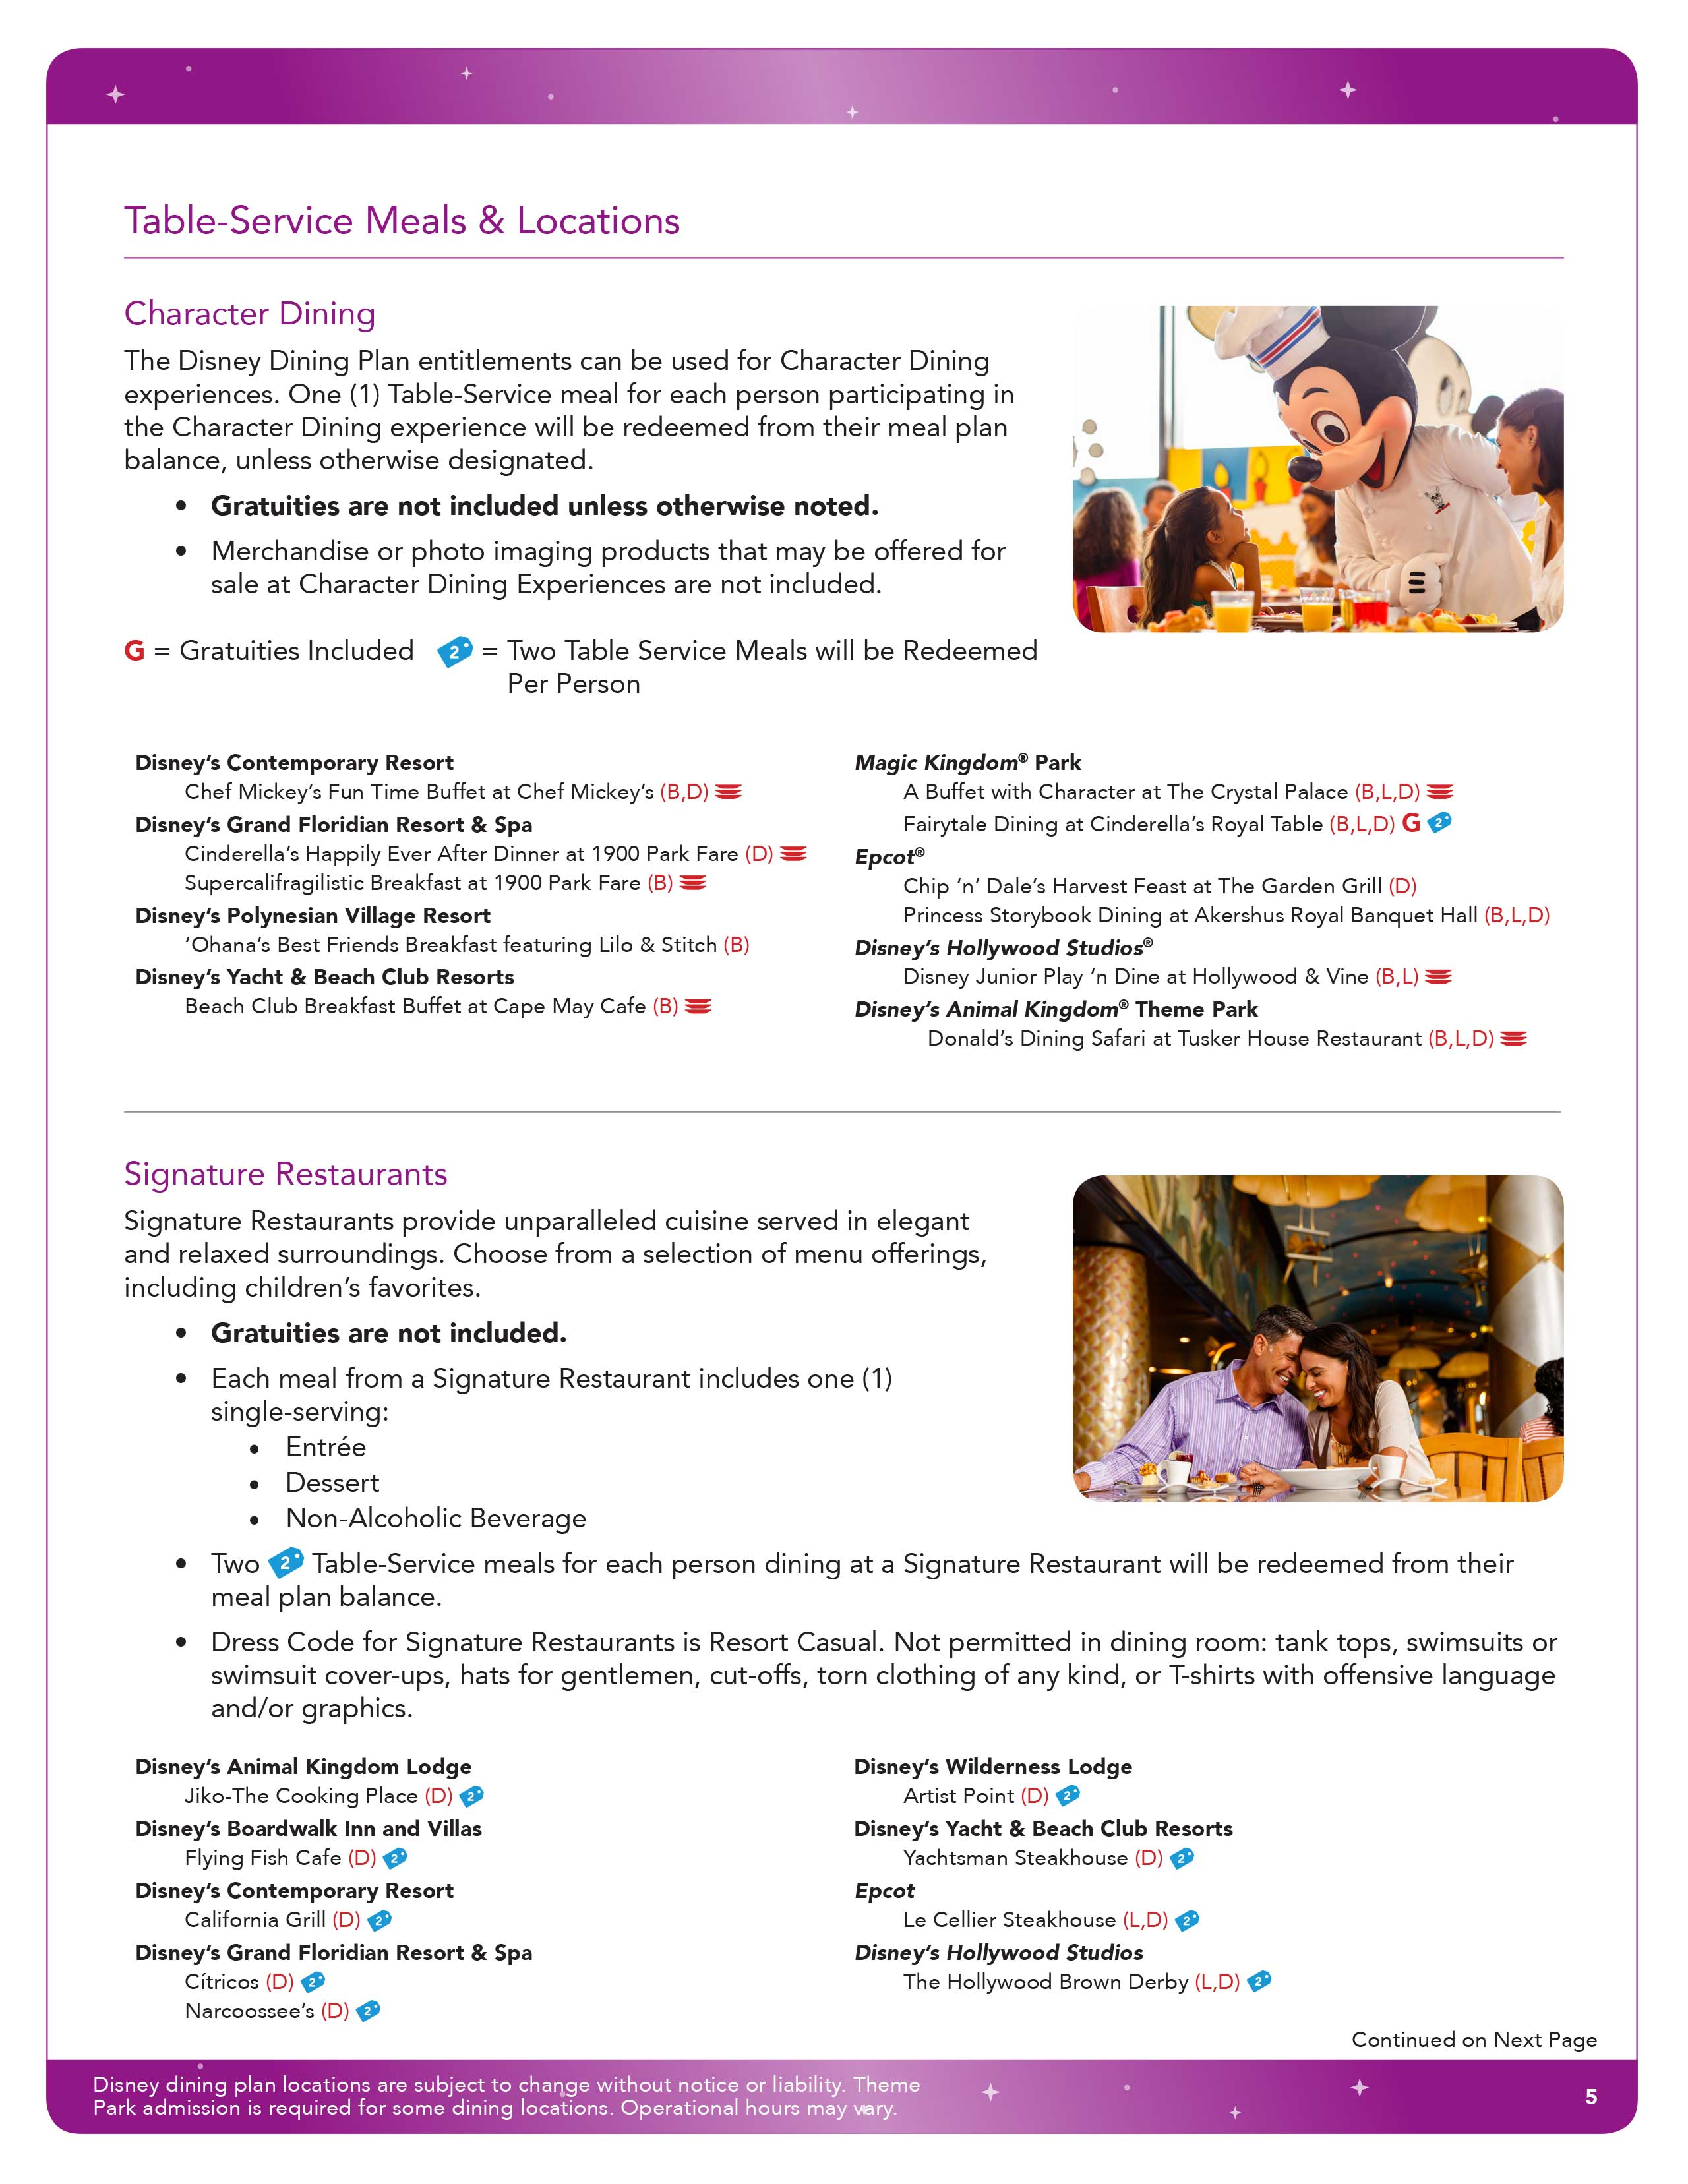 2016 disney dining plan brochure page 5 copyright 2017 the walt